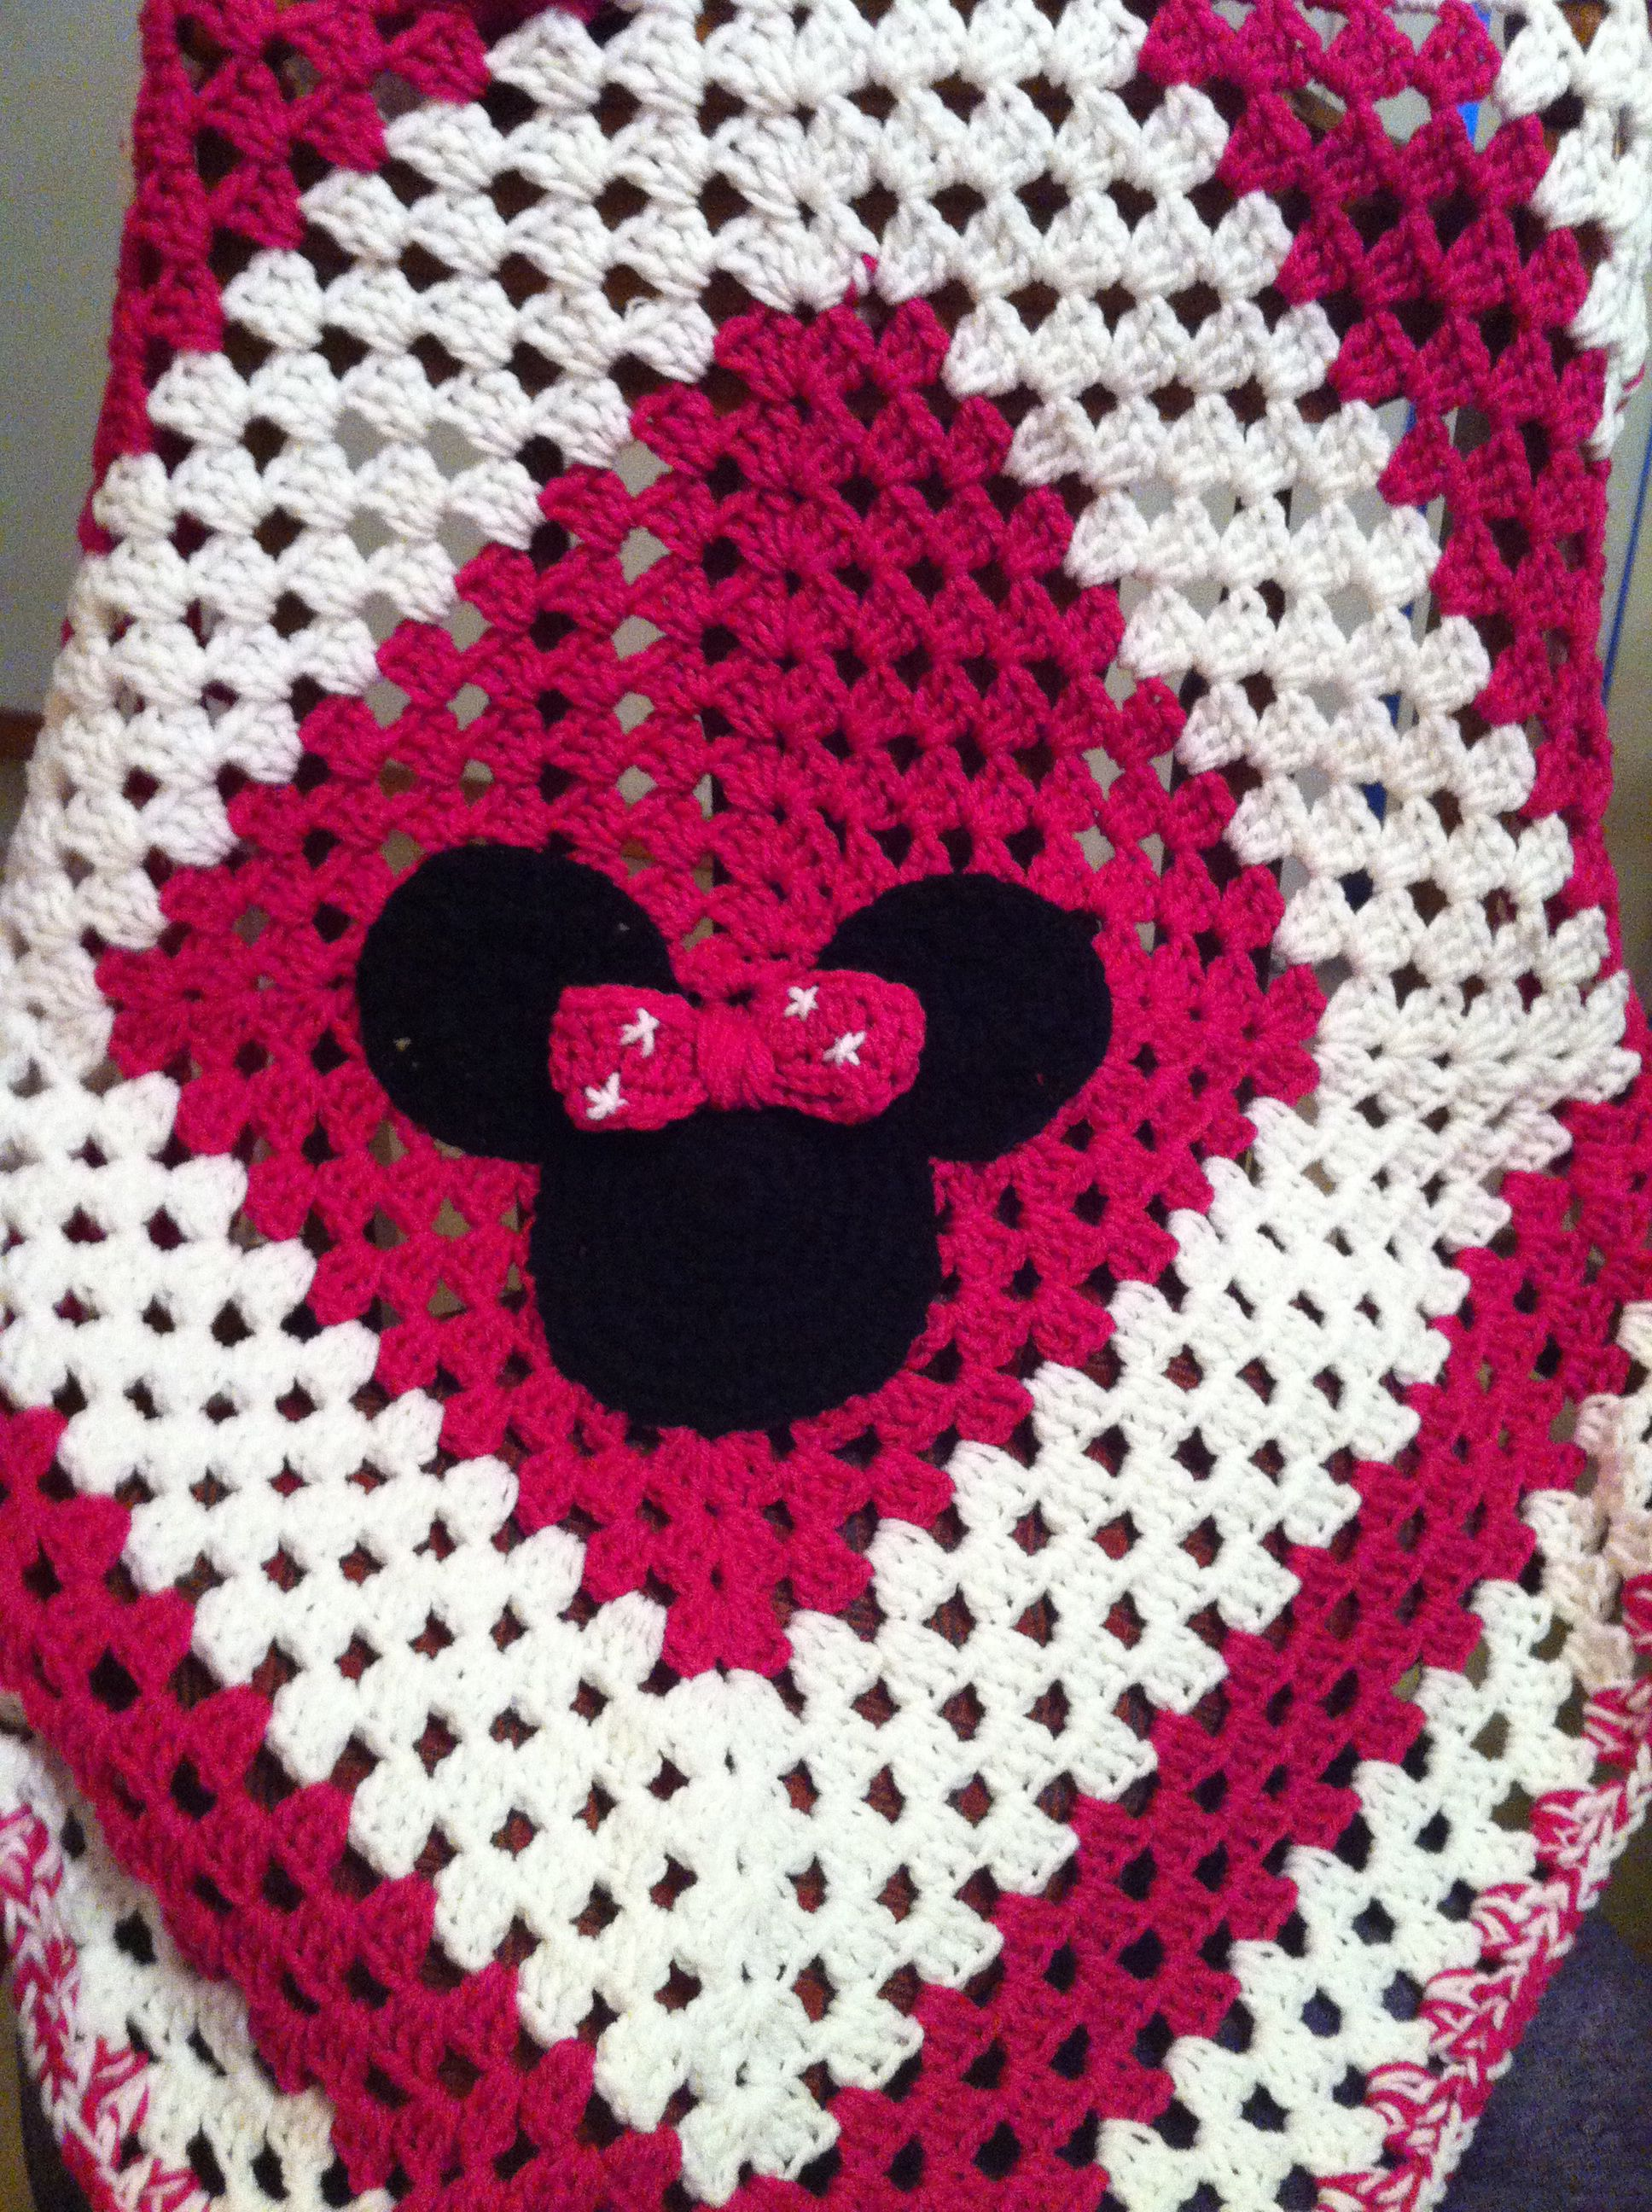 Free Amigurumi Disney Patterns : Disney crochet minnie mouse blanket crochet blanket aphgans